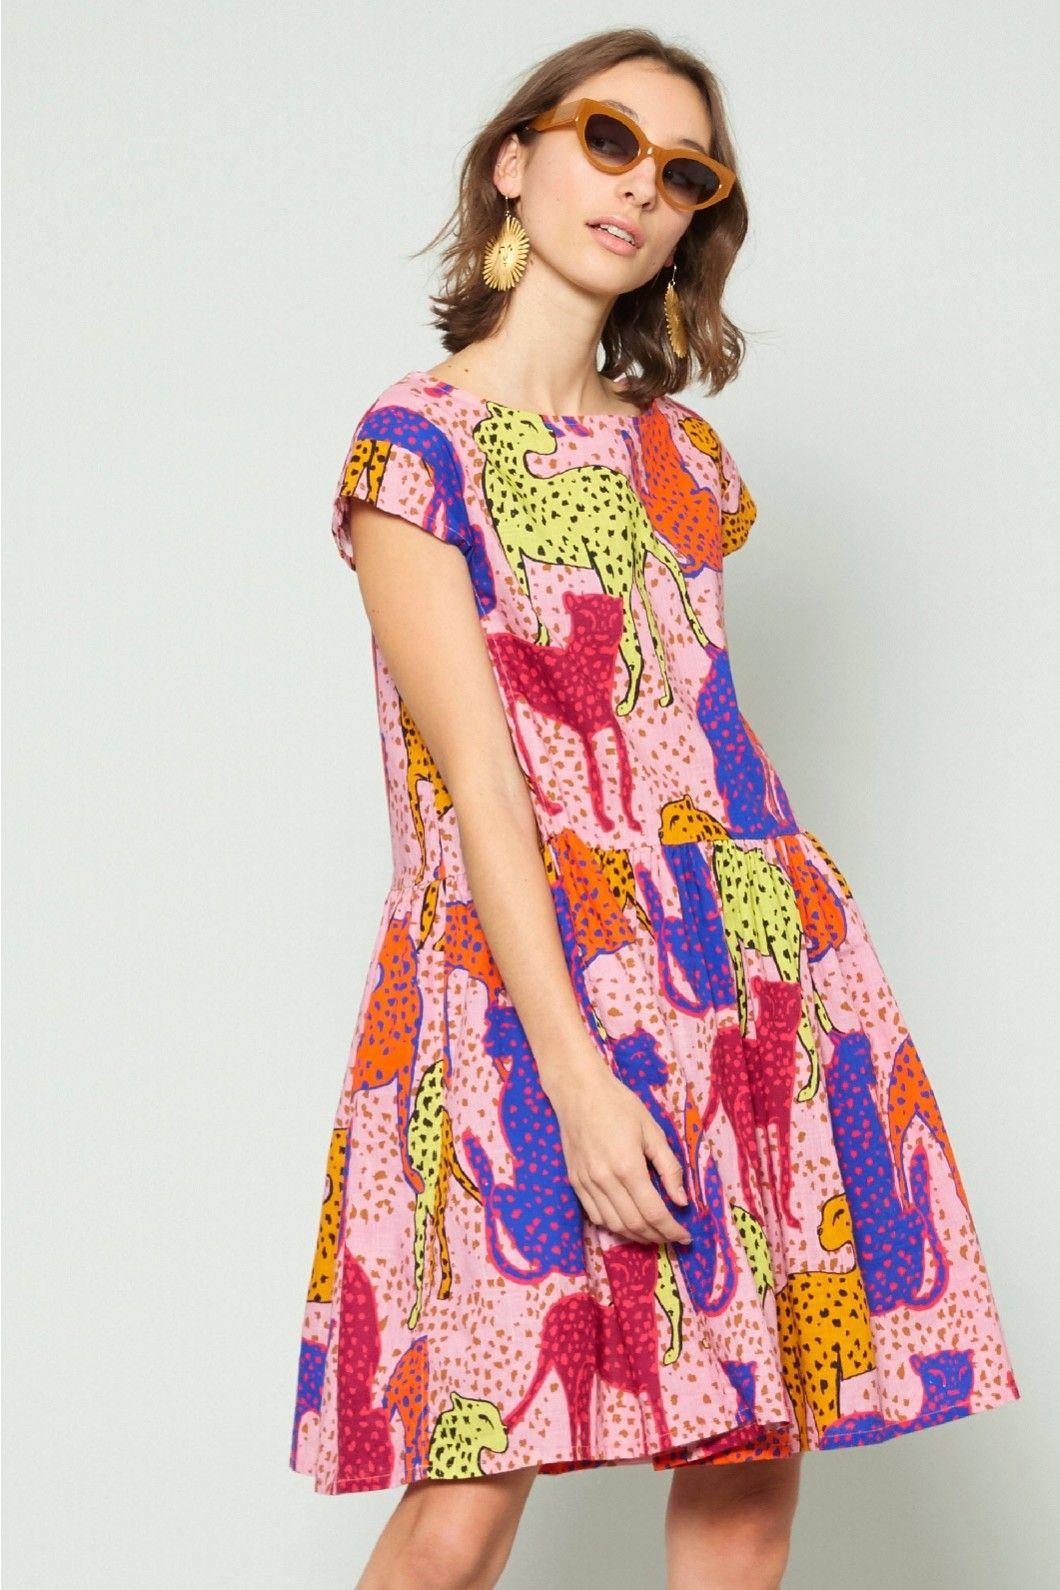 Gorman Online Cheetah Beach Dress Dresses Clothing Shop Clothes For Women Colorful Fashion Dresses [ 1590 x 1060 Pixel ]